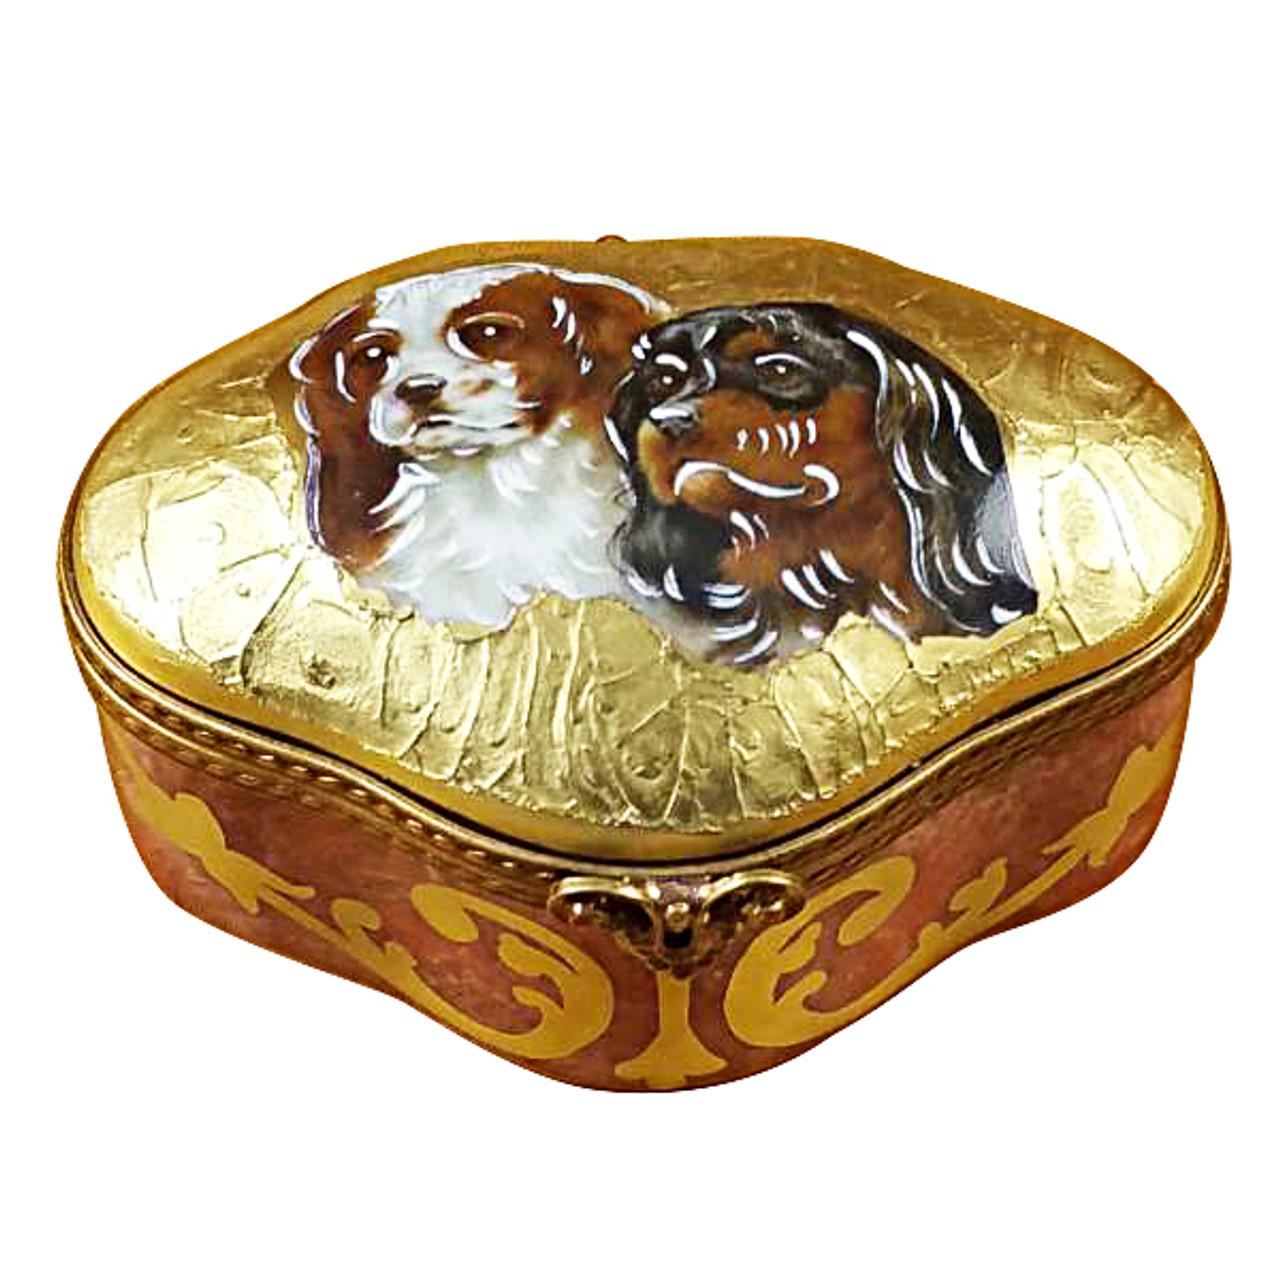 King Charles Spaniels Rochard Limoges Box